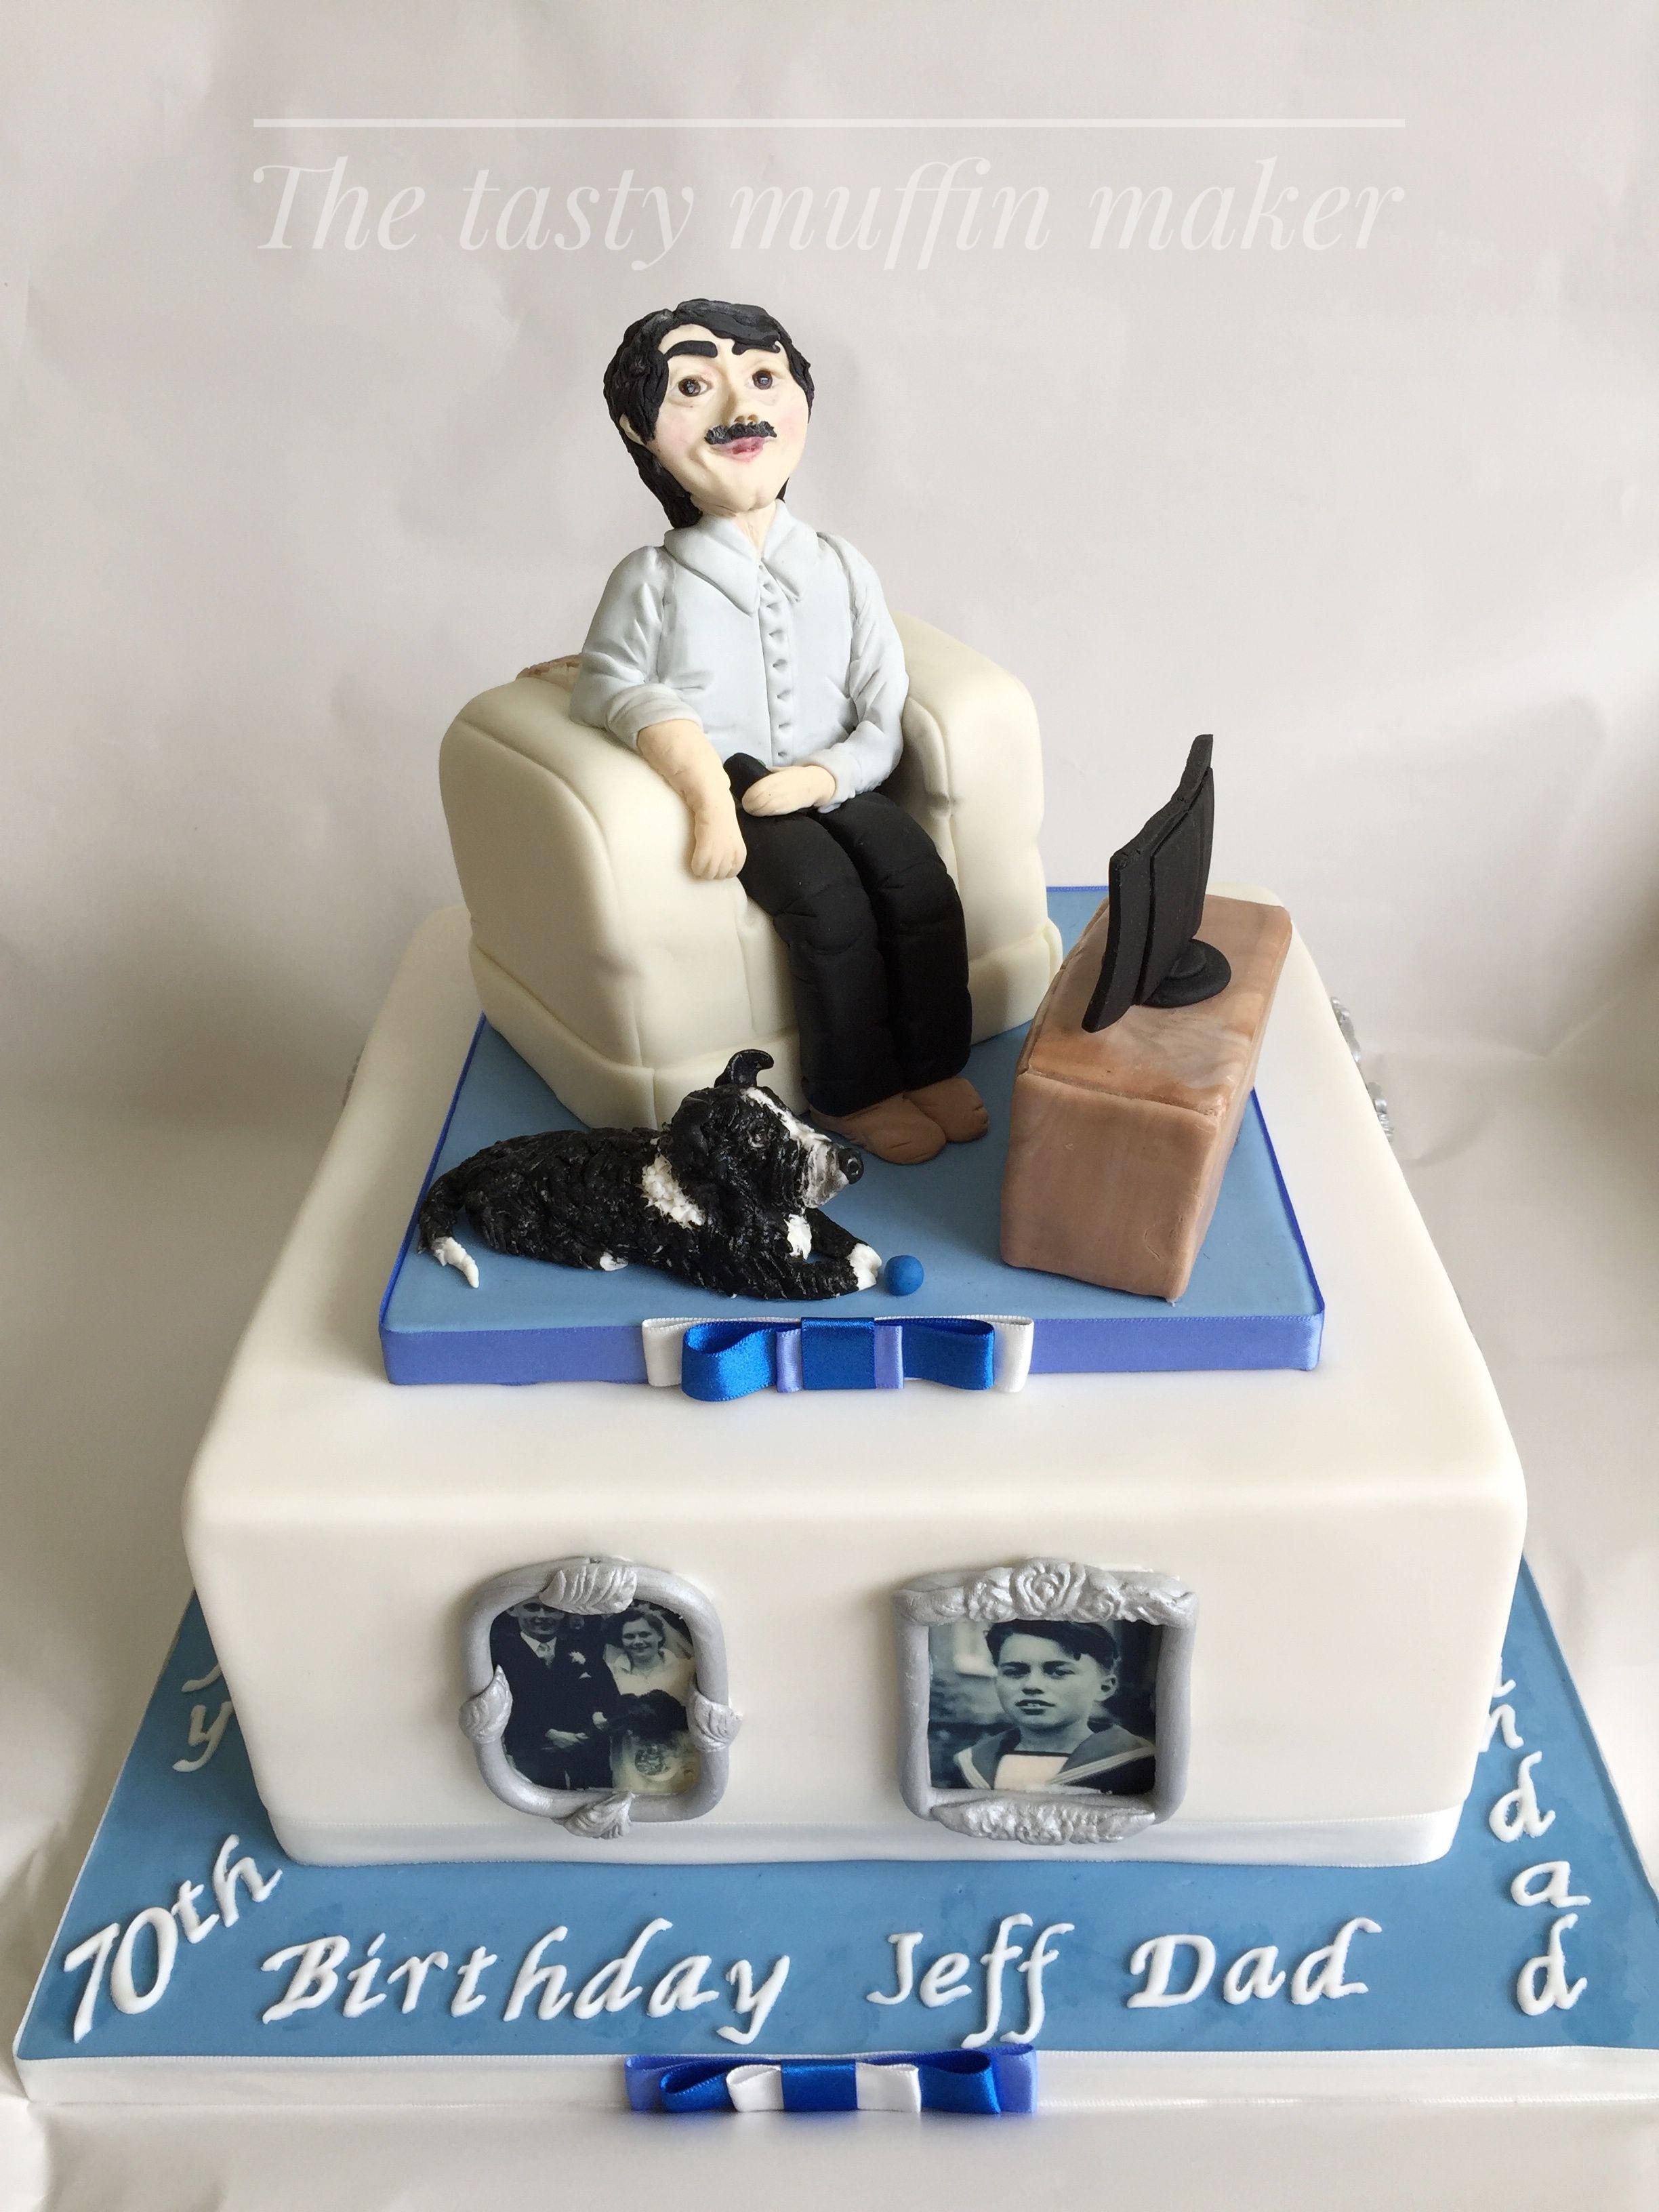 70th Birthday Cakemale Watching Tv Creative Cakes Ideas